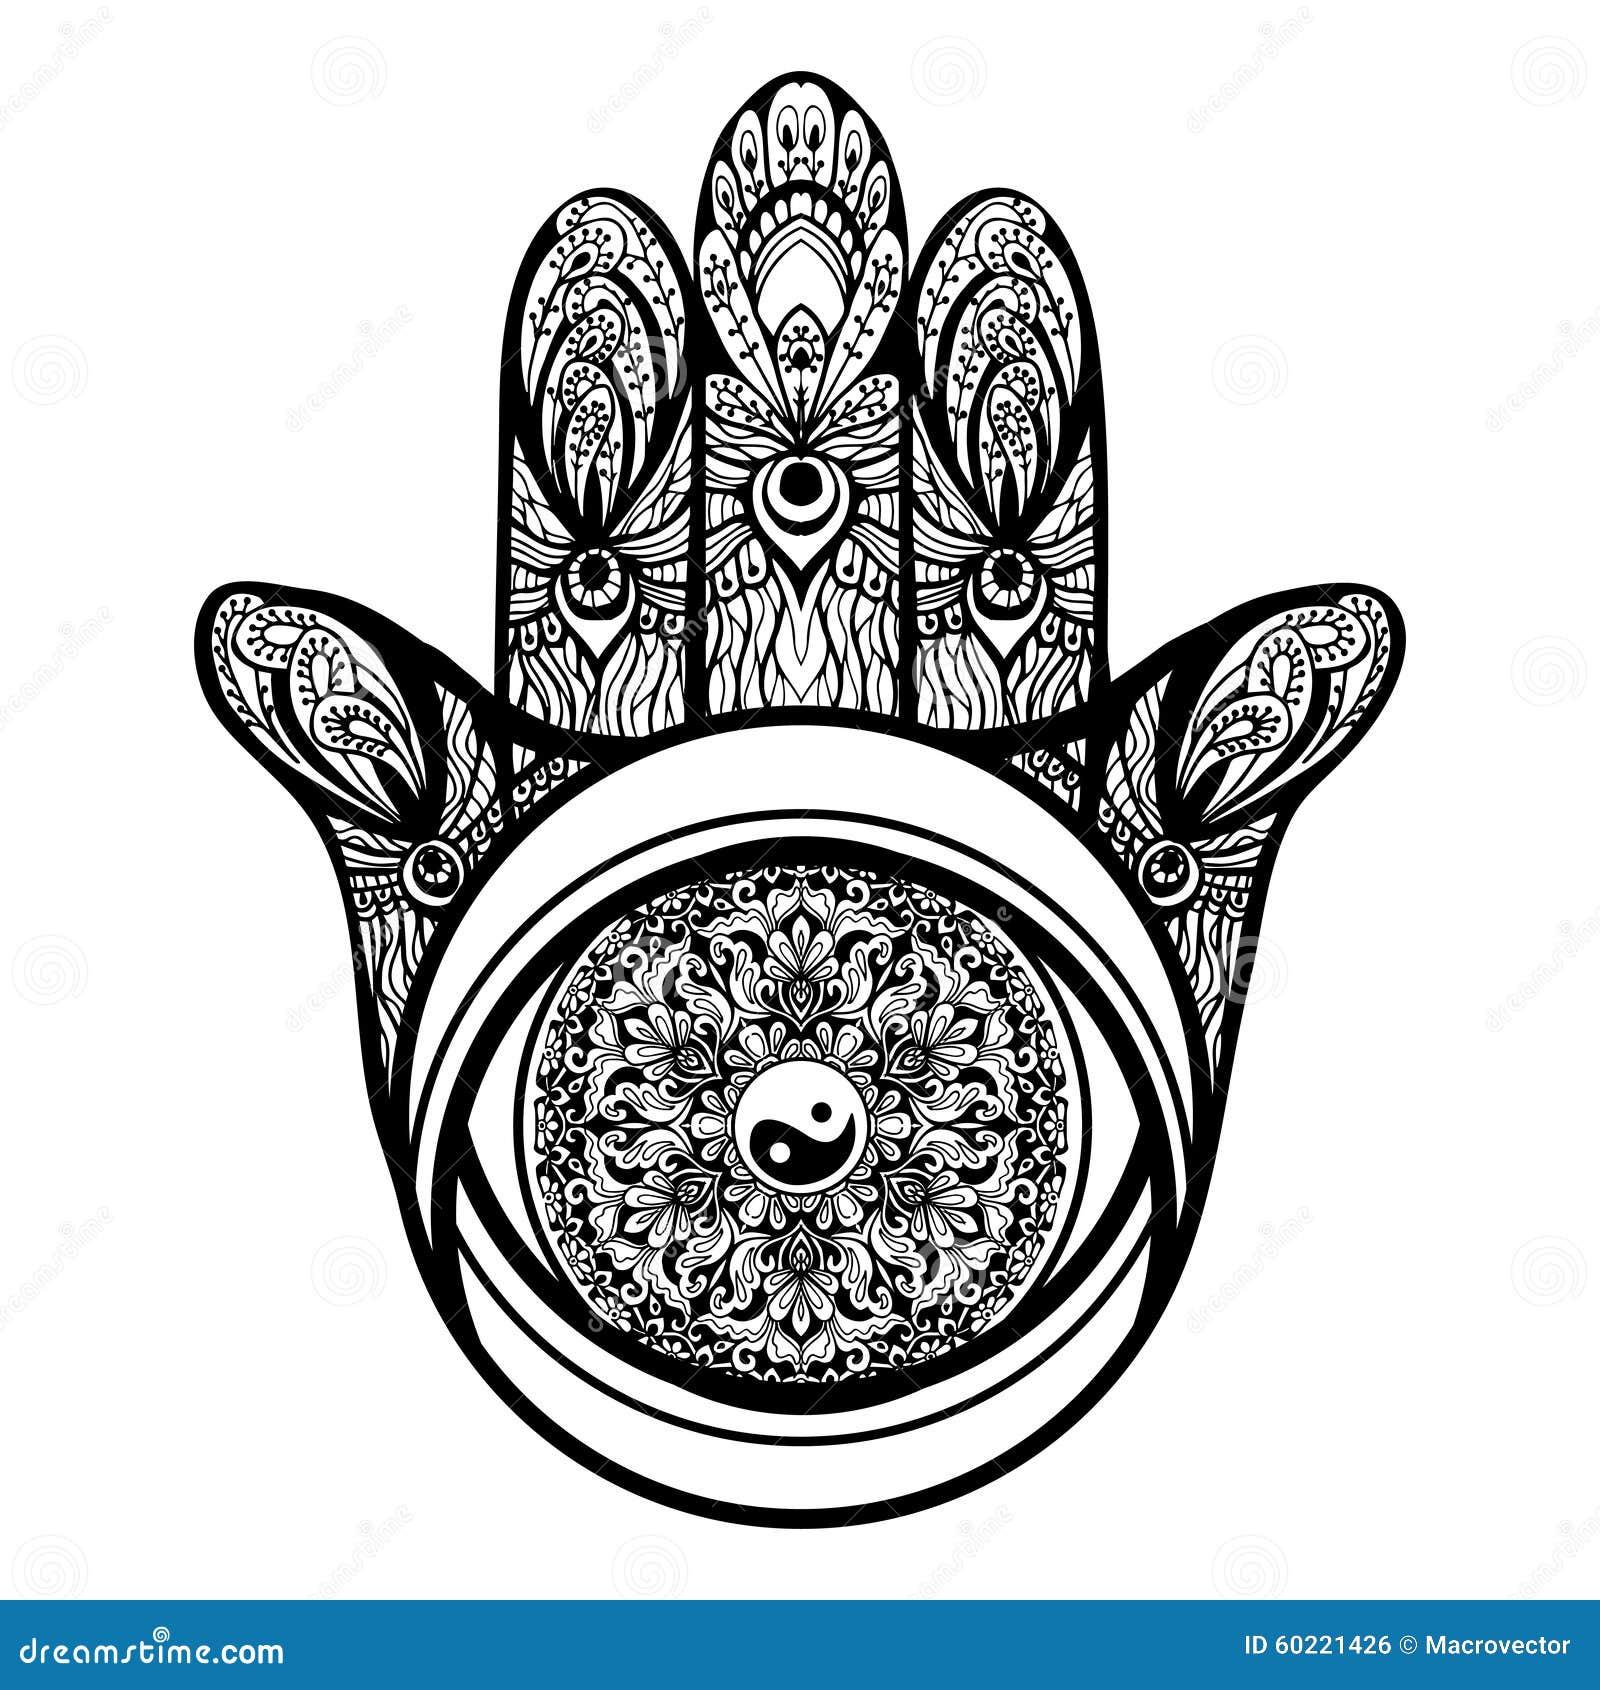 Hamsa Hand Illustration Stock Vector Illustration Of Magic 60221426